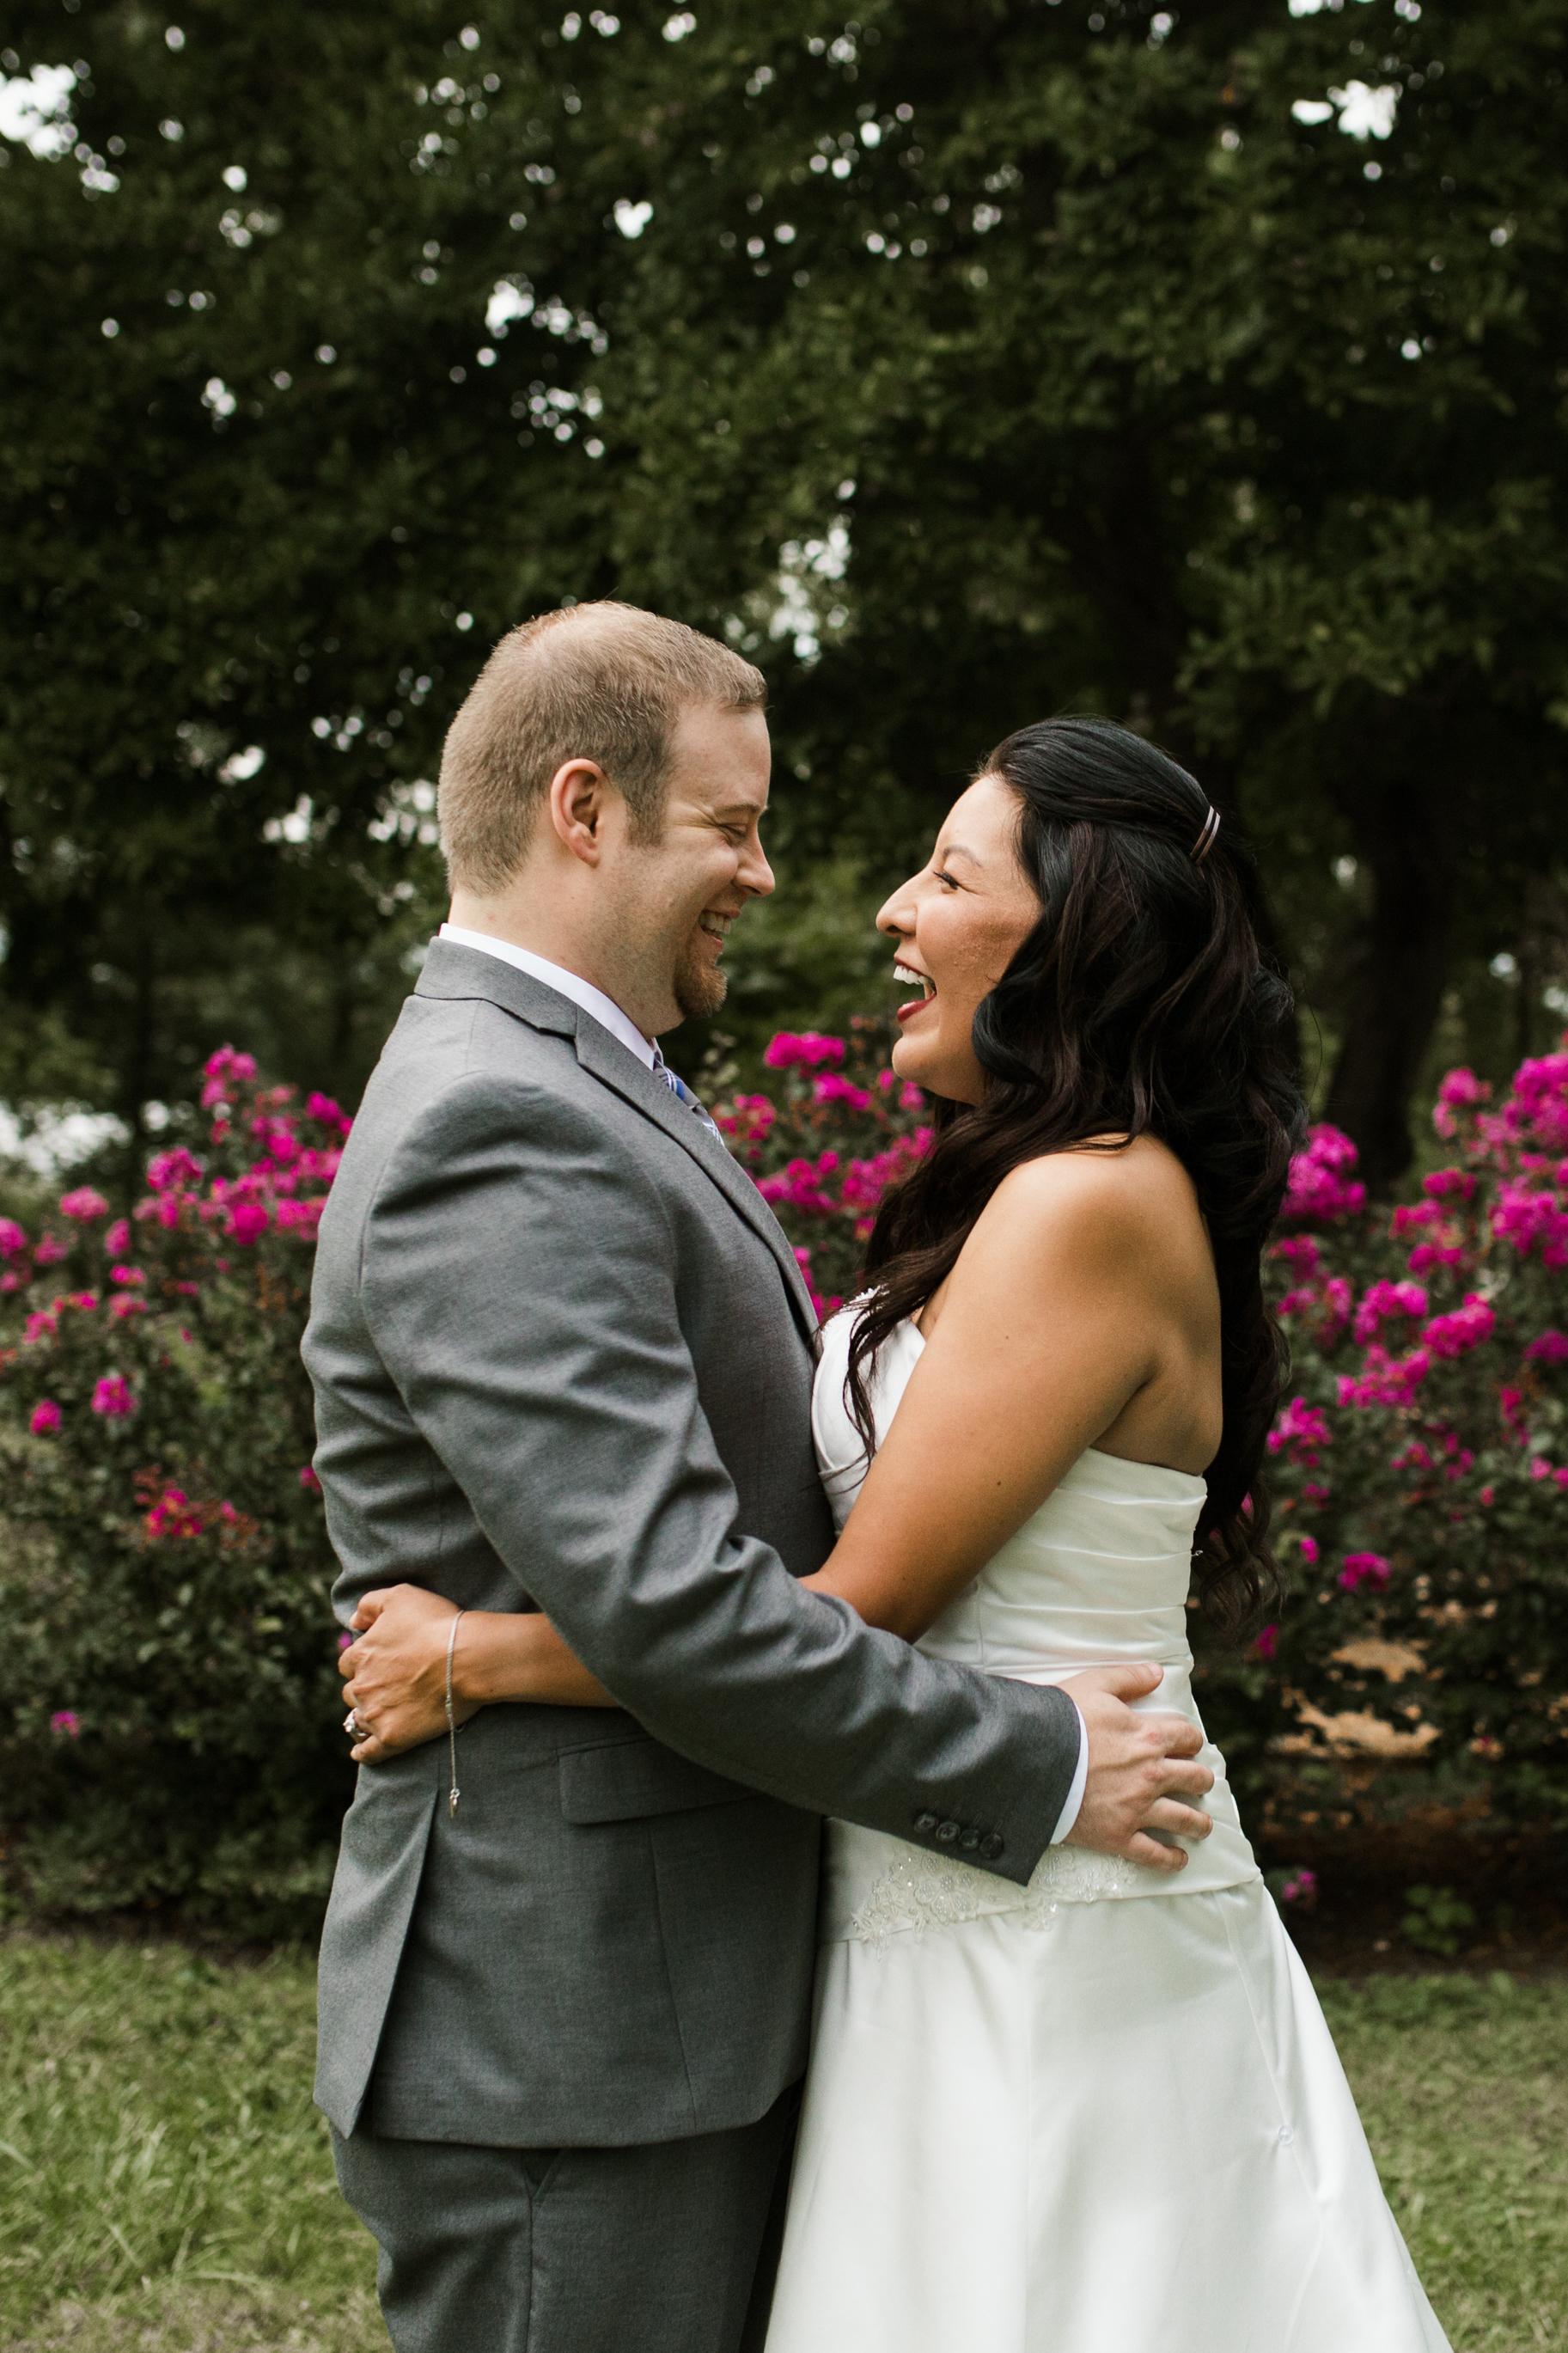 Kentucky Wedding Louisville Wedding Photographer 2018 Crystal Ludwick Photo Louisville Wedding Photographer Kentucky Wedding Photographer (62 of 76).jpg